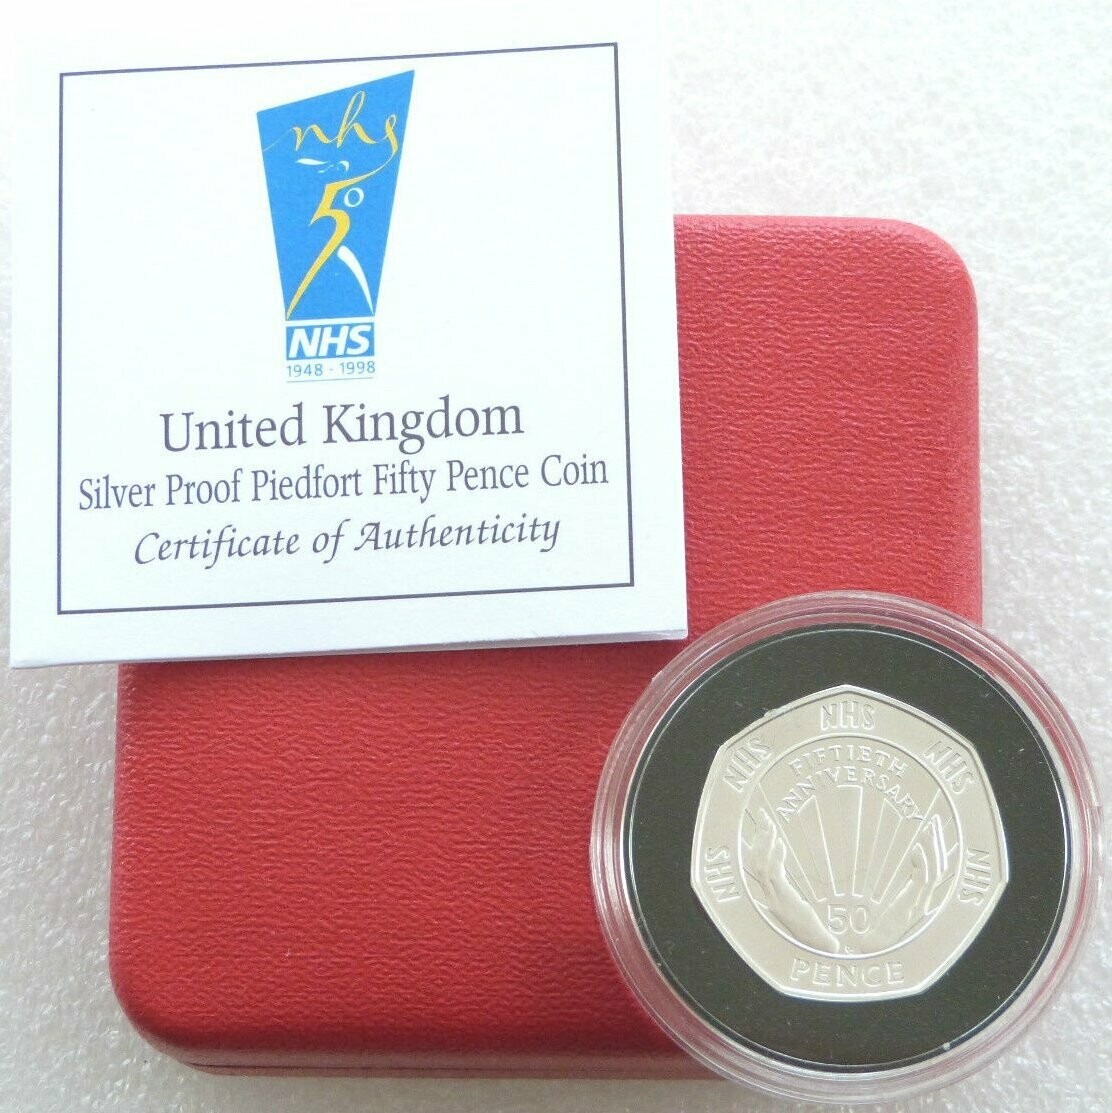 1998 50p coin nhs